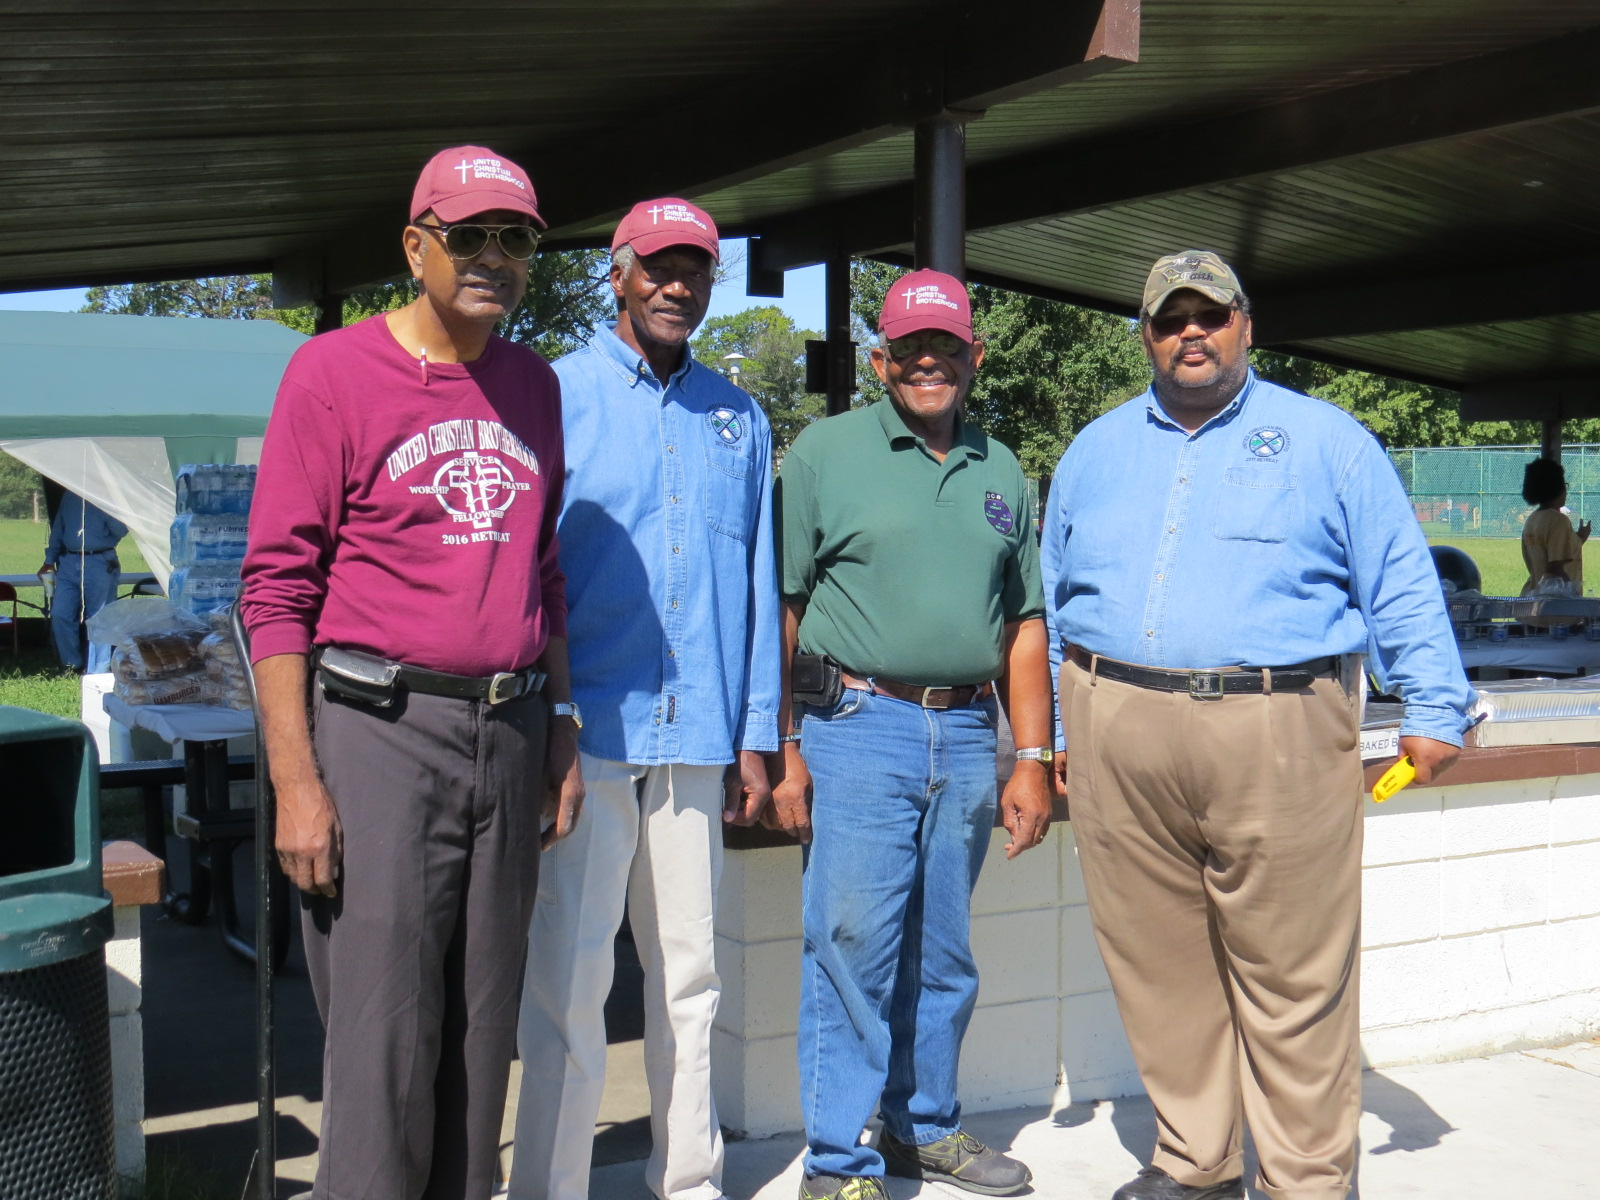 UCB Men Participants at 2017 Family Day